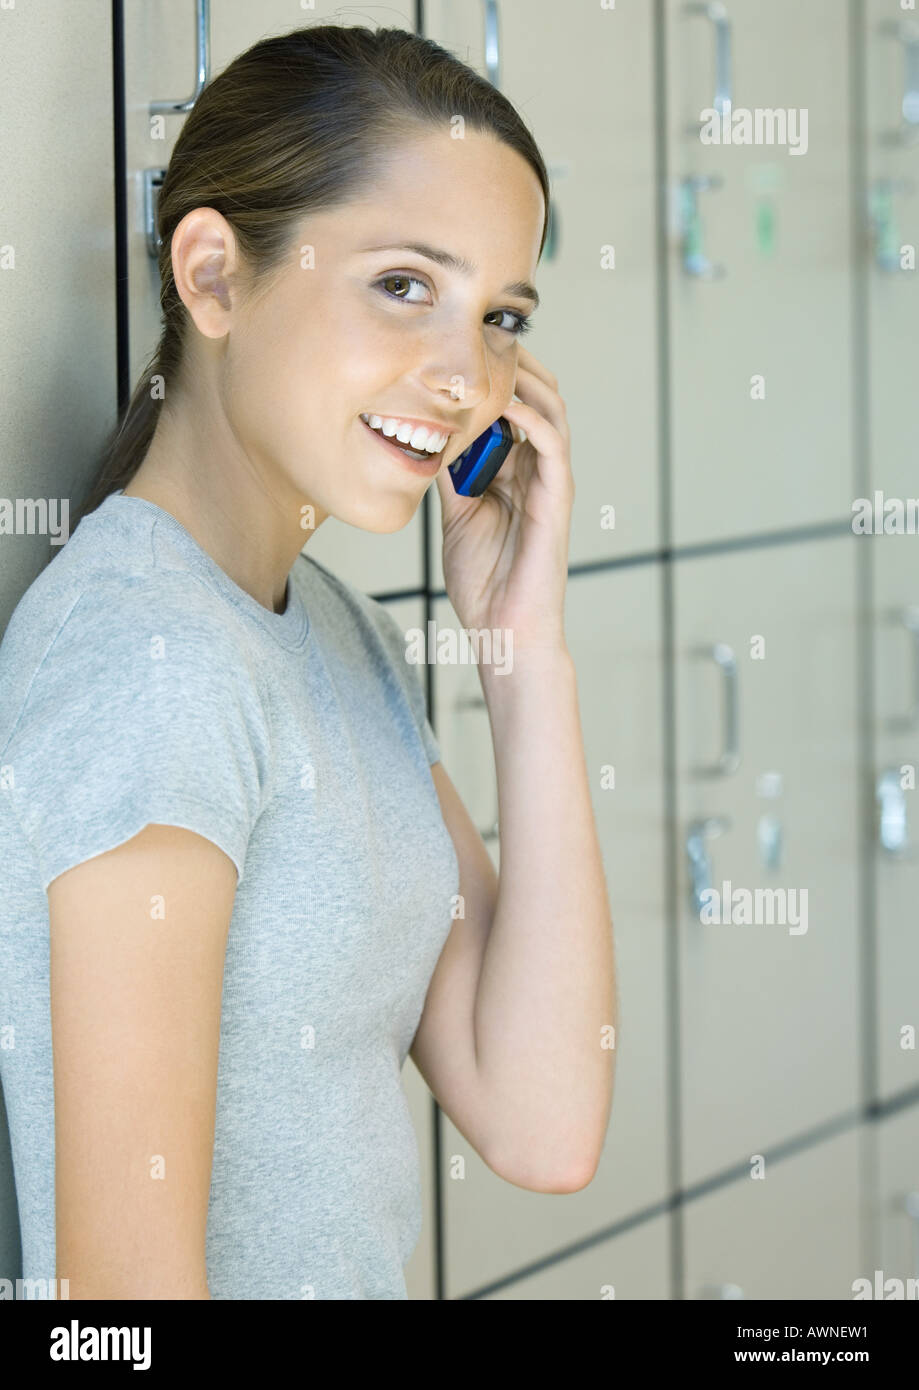 Preteen girl using phone - Stock Image